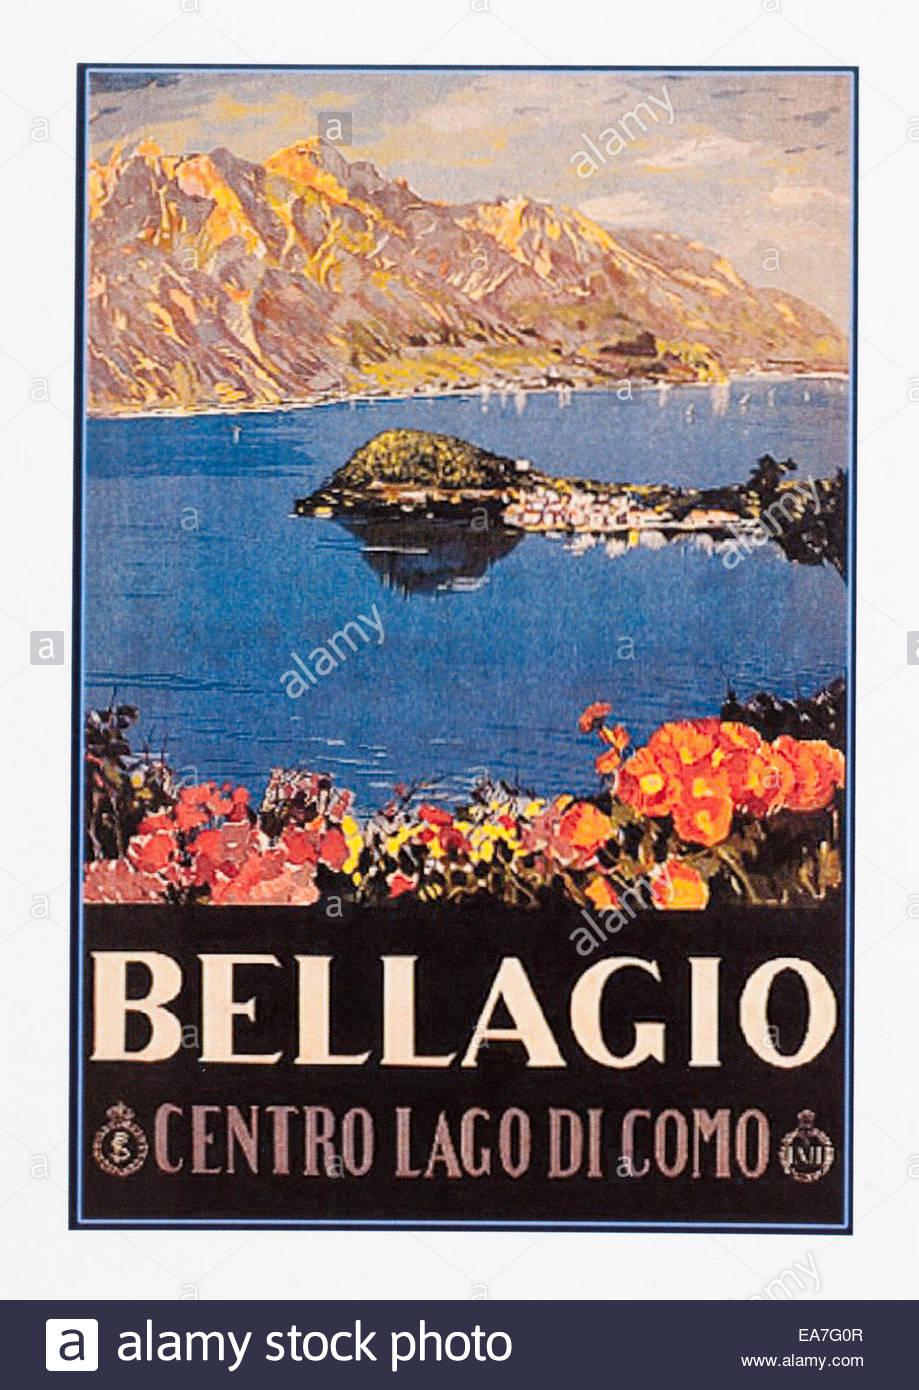 Vintage travel poster advertising Bellagio Centro Lago Di Como. Editorial Only - Stock Image